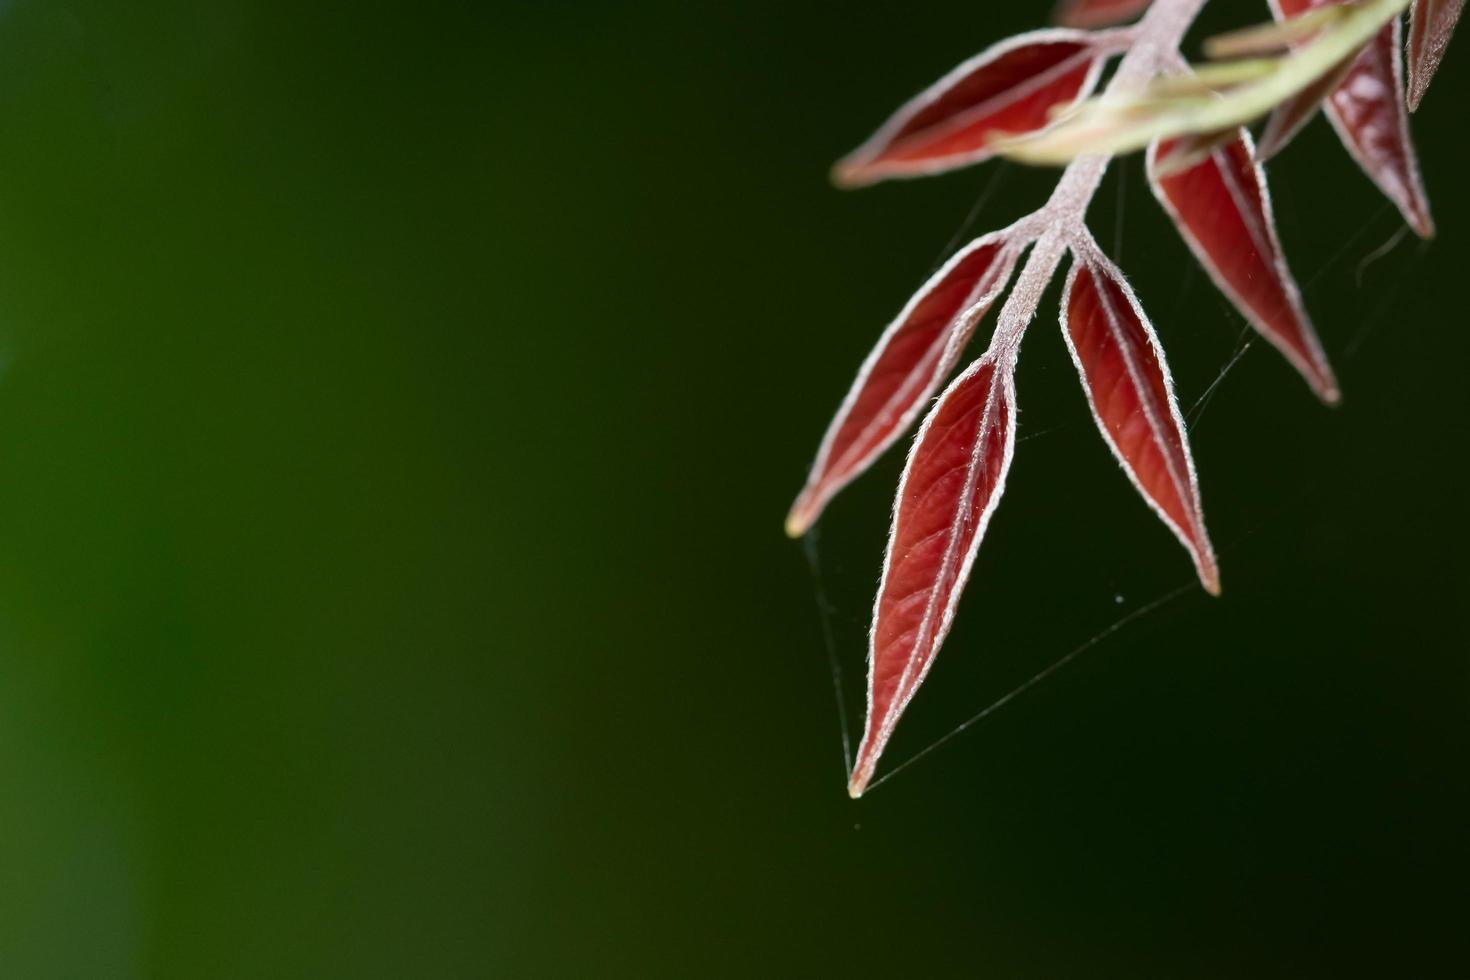 foglie rosse su sfondo verde foto